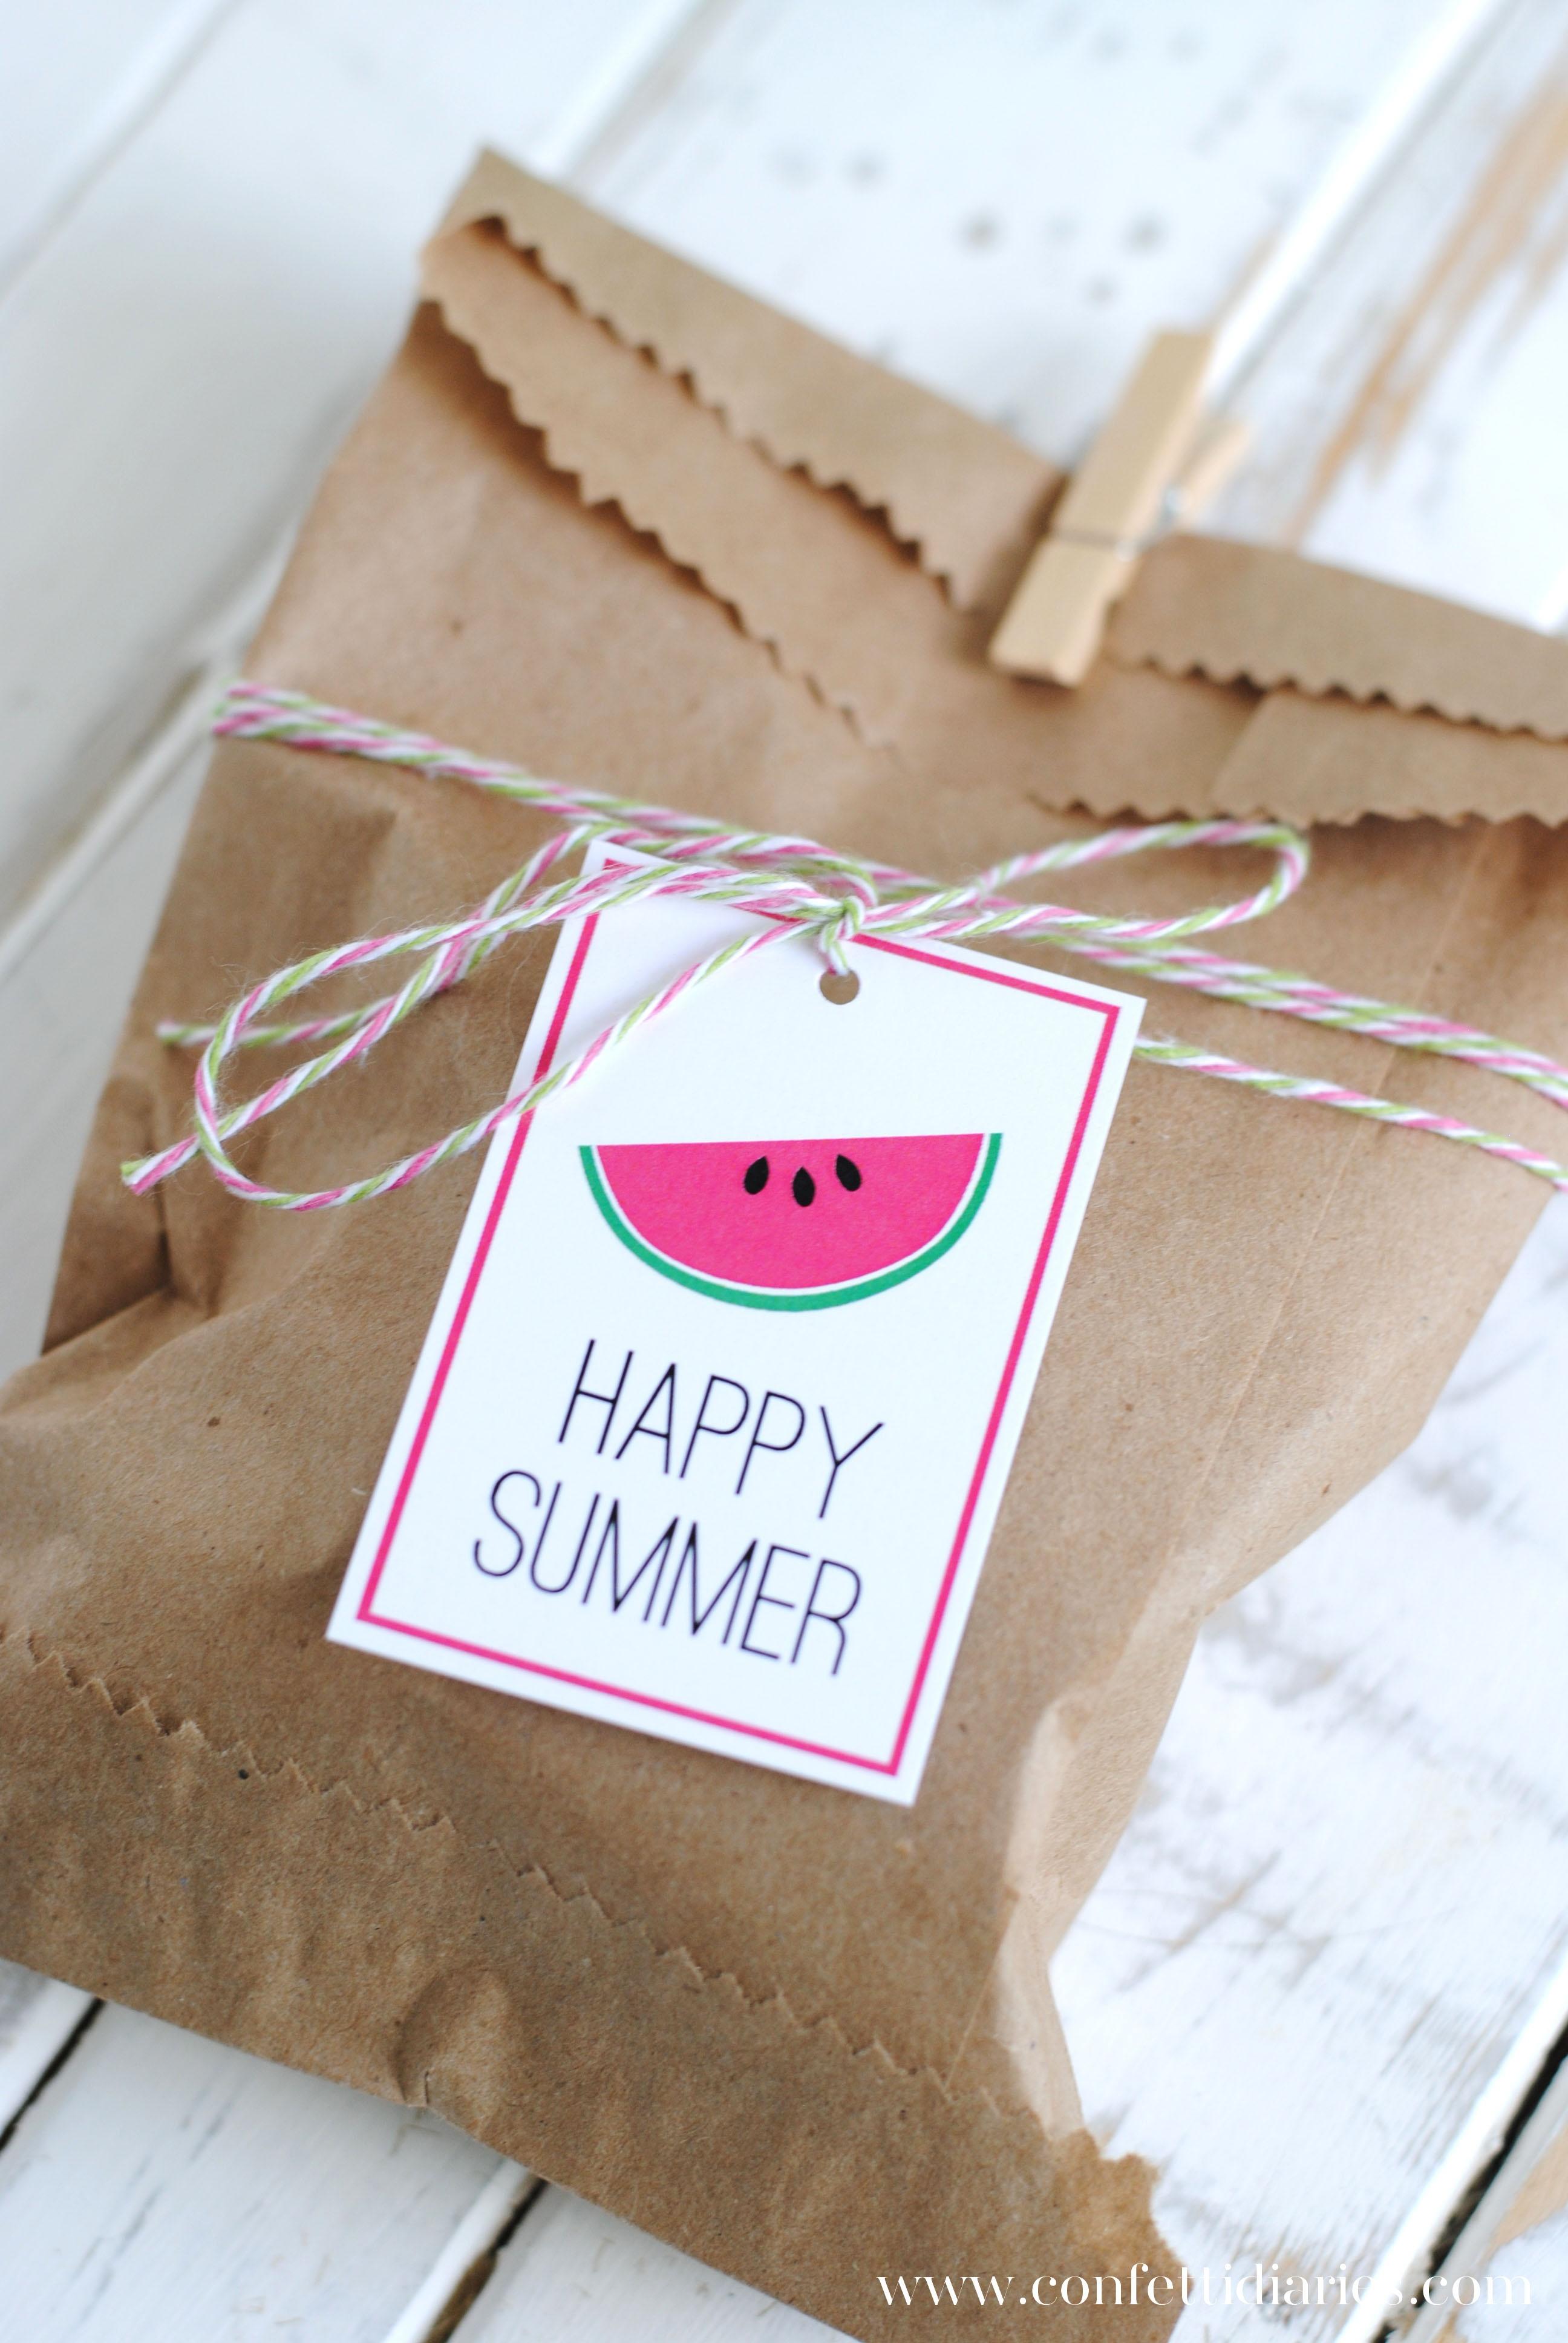 Free Printable Happy Summer Gift Tags - Katarina's Paperie - Free Printable Gift Bag Tags